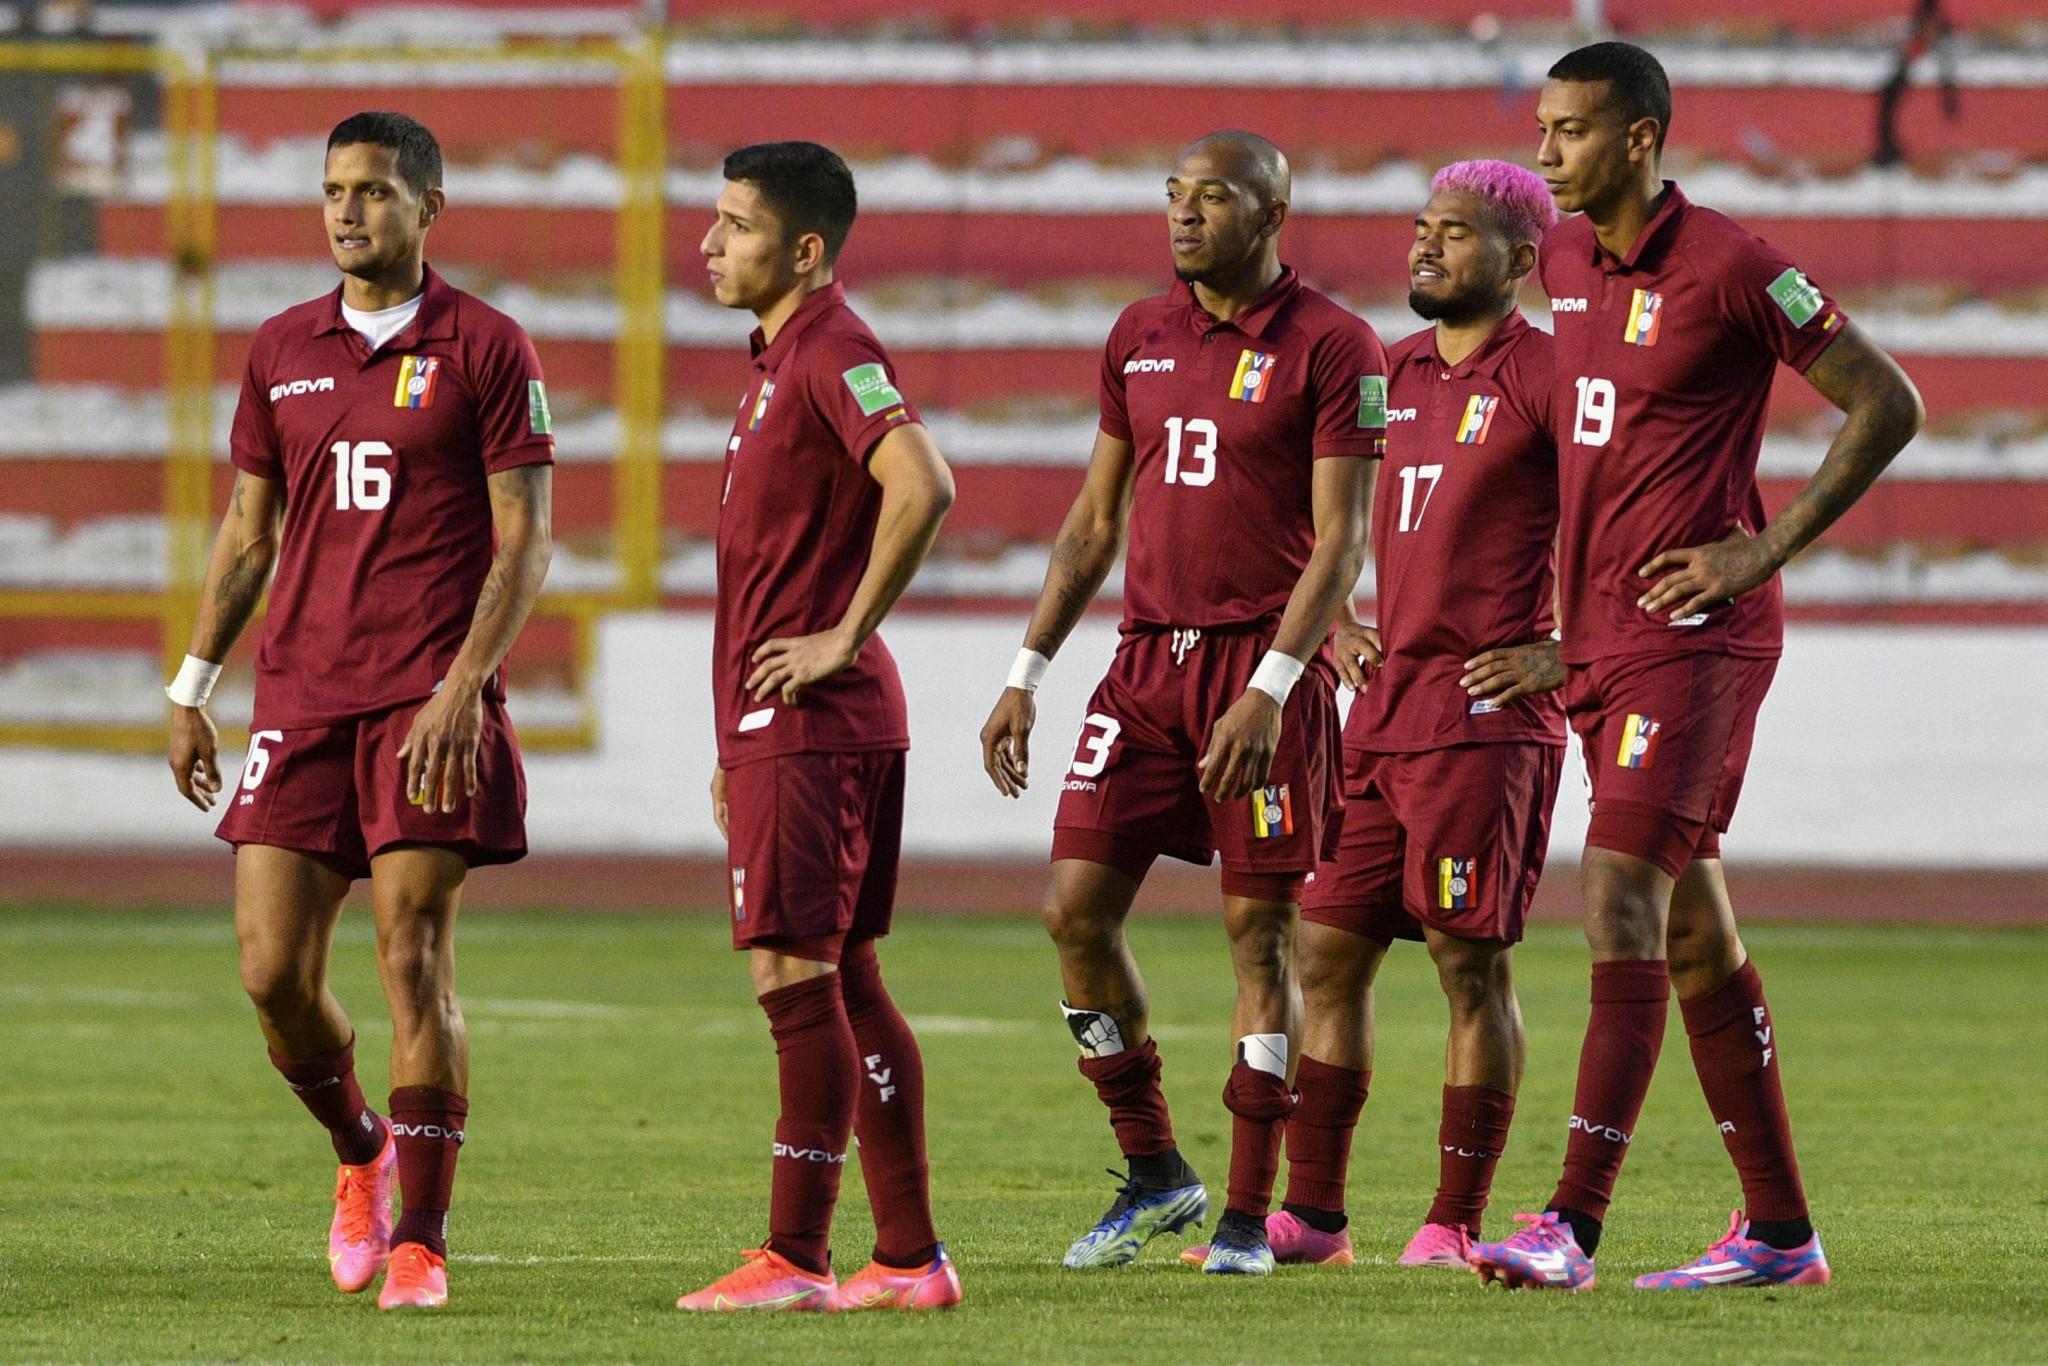 Venezuela hit by COVID-19 outbreak on eve of Copa América opener